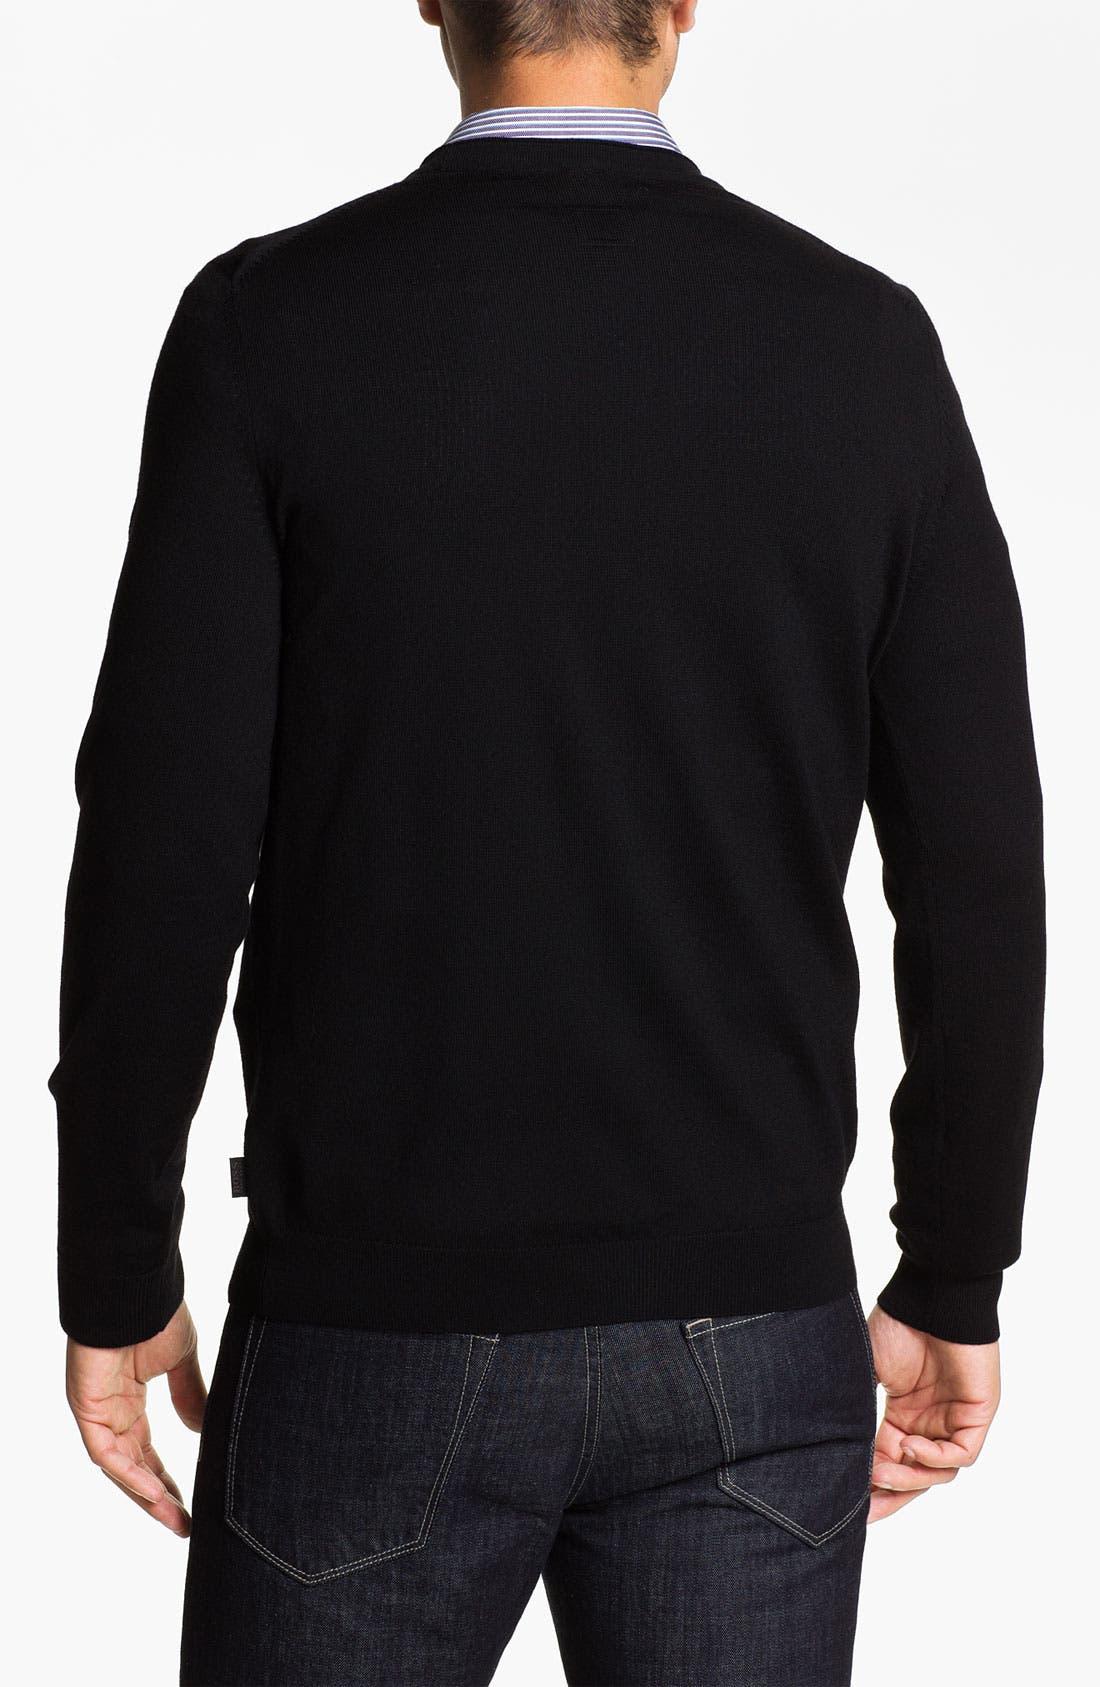 Black 'Baltimore' Wool Button Cardigan,                             Alternate thumbnail 2, color,                             001